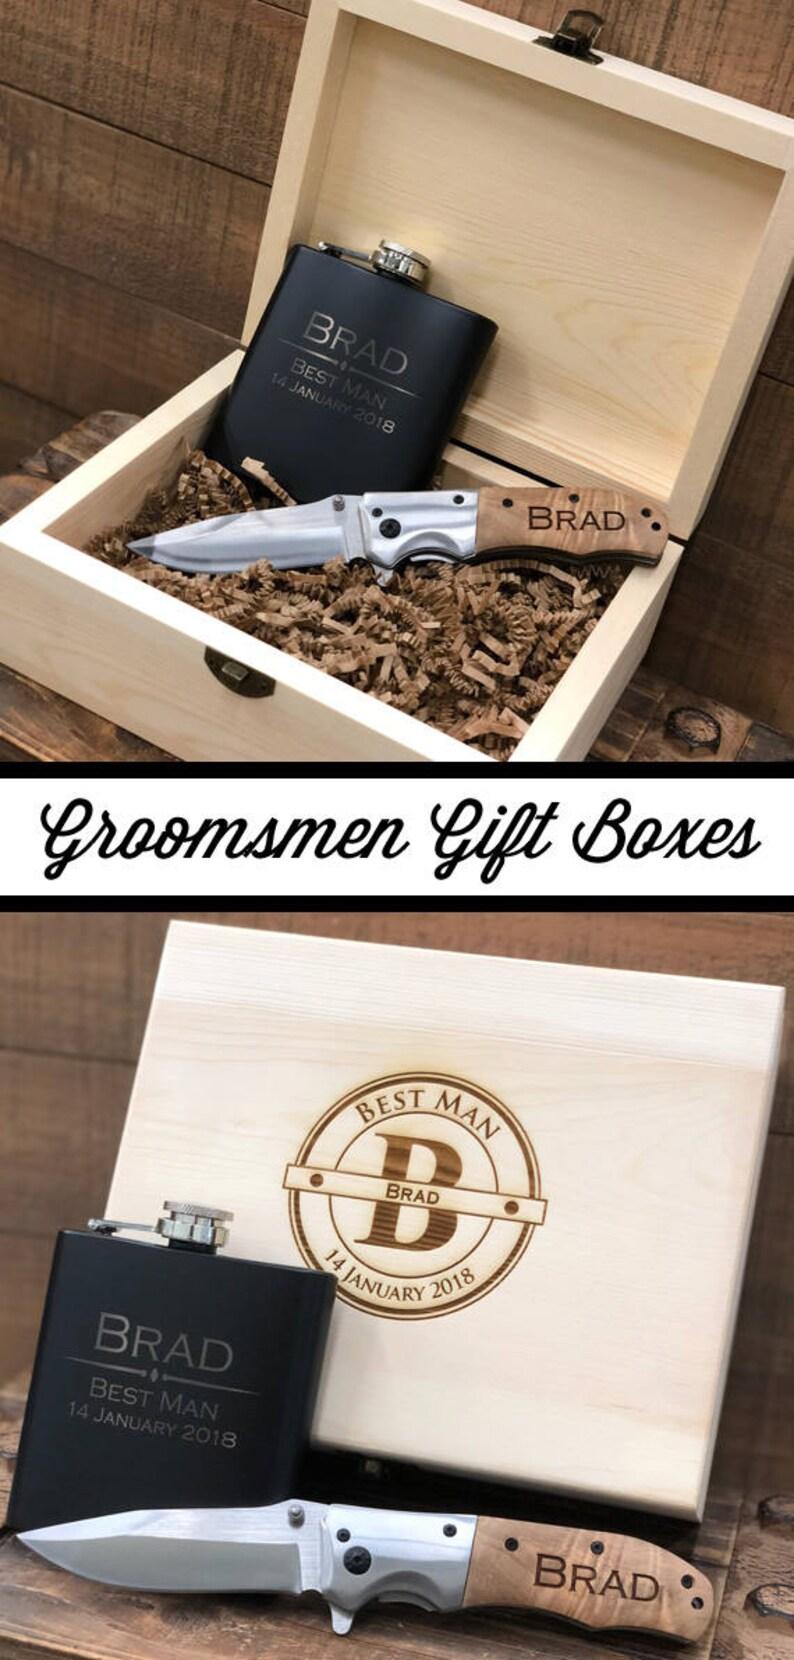 Groomsmen Gift Set Groomsman Gift Box Groomsmen Gift Box Unique Groomsmen Gifts Creative Groomsmen Gifts Groomsmen Gifts Ideas Wedding